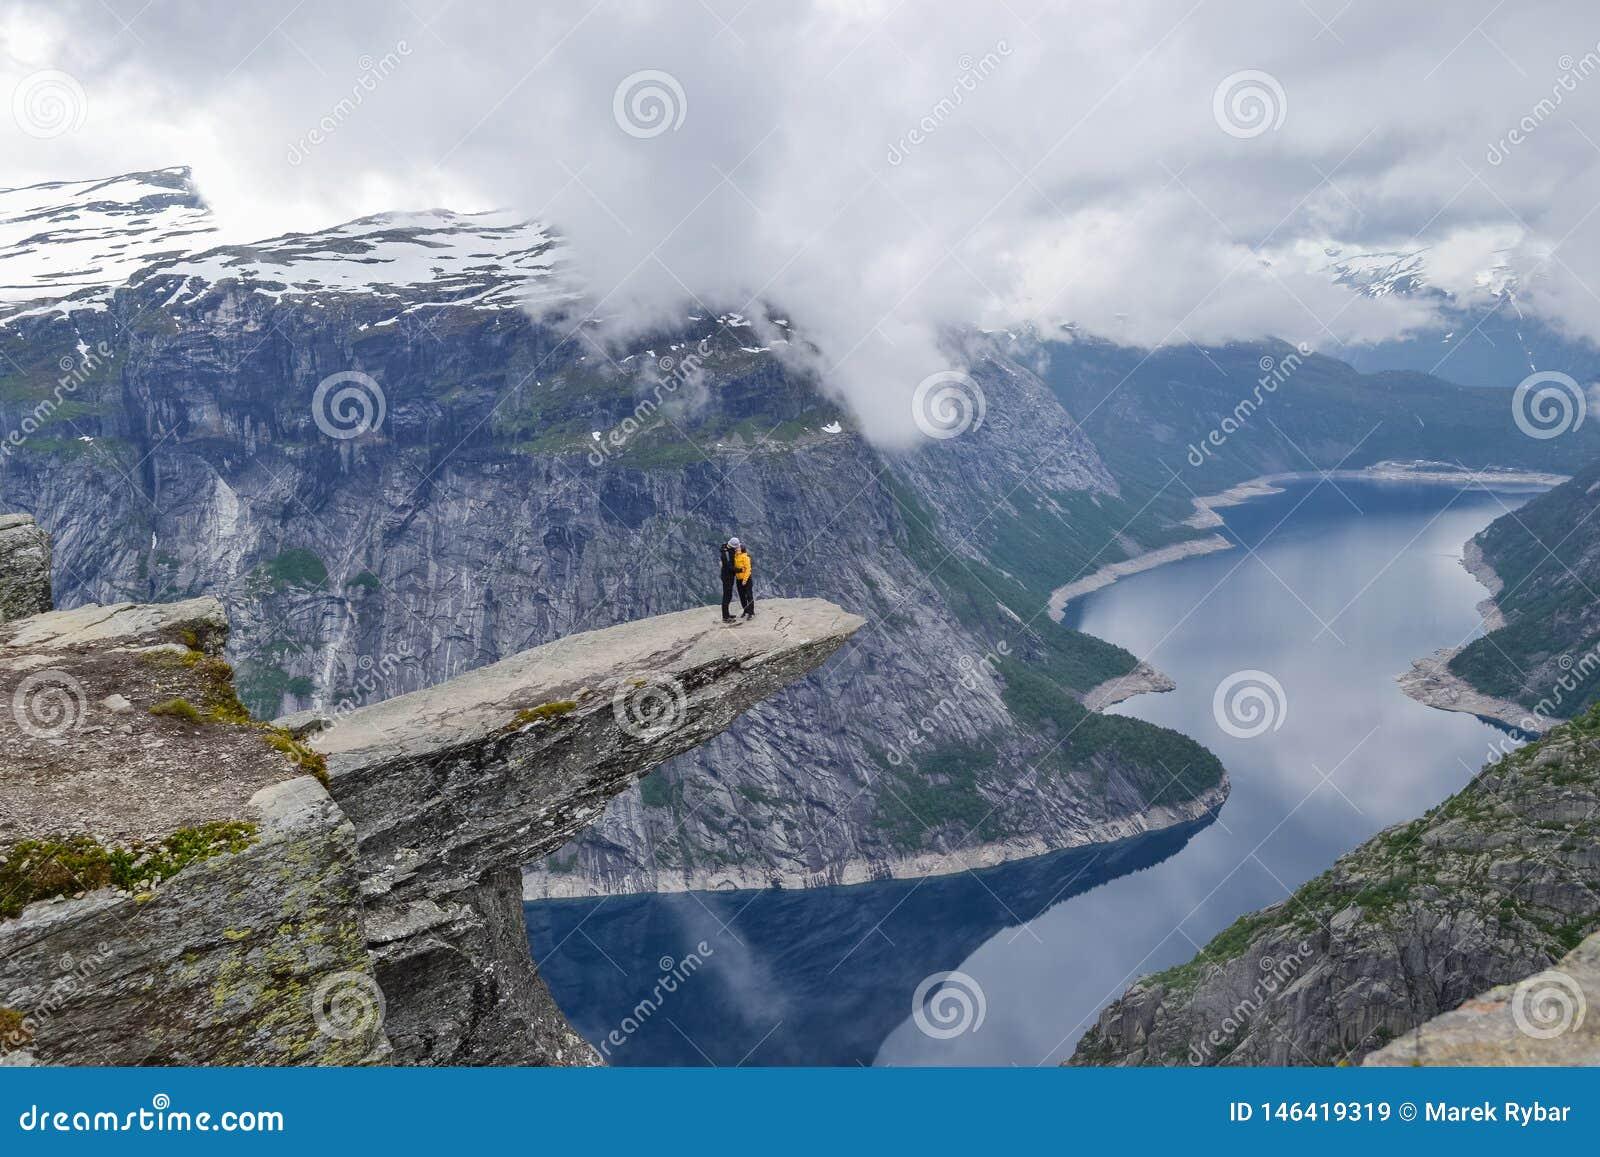 Trolltunga, Odda, Norway 21. June 2016, Hikers on the hiking trail to the world famous Trolltunga hike. Beautiful Norway, outdoors